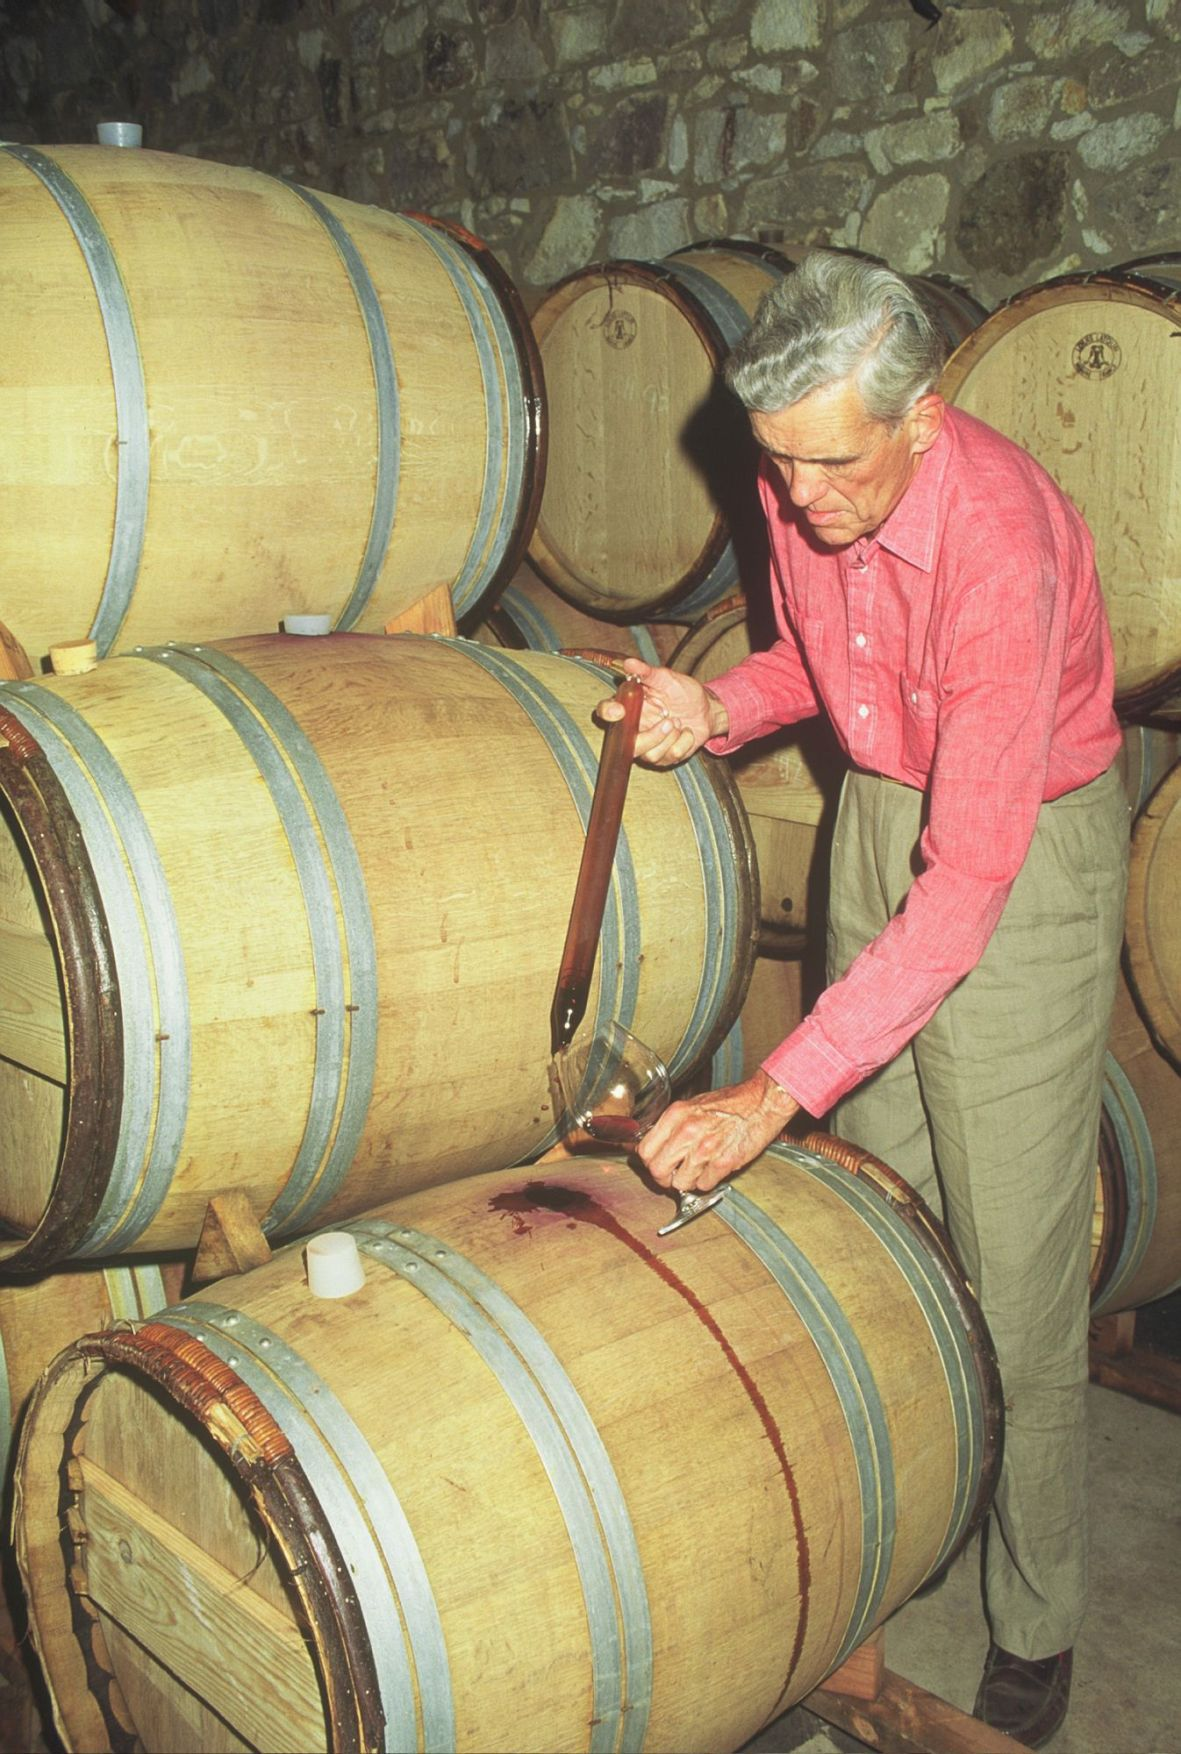 William Seavey, founder of Seavey Vineyards